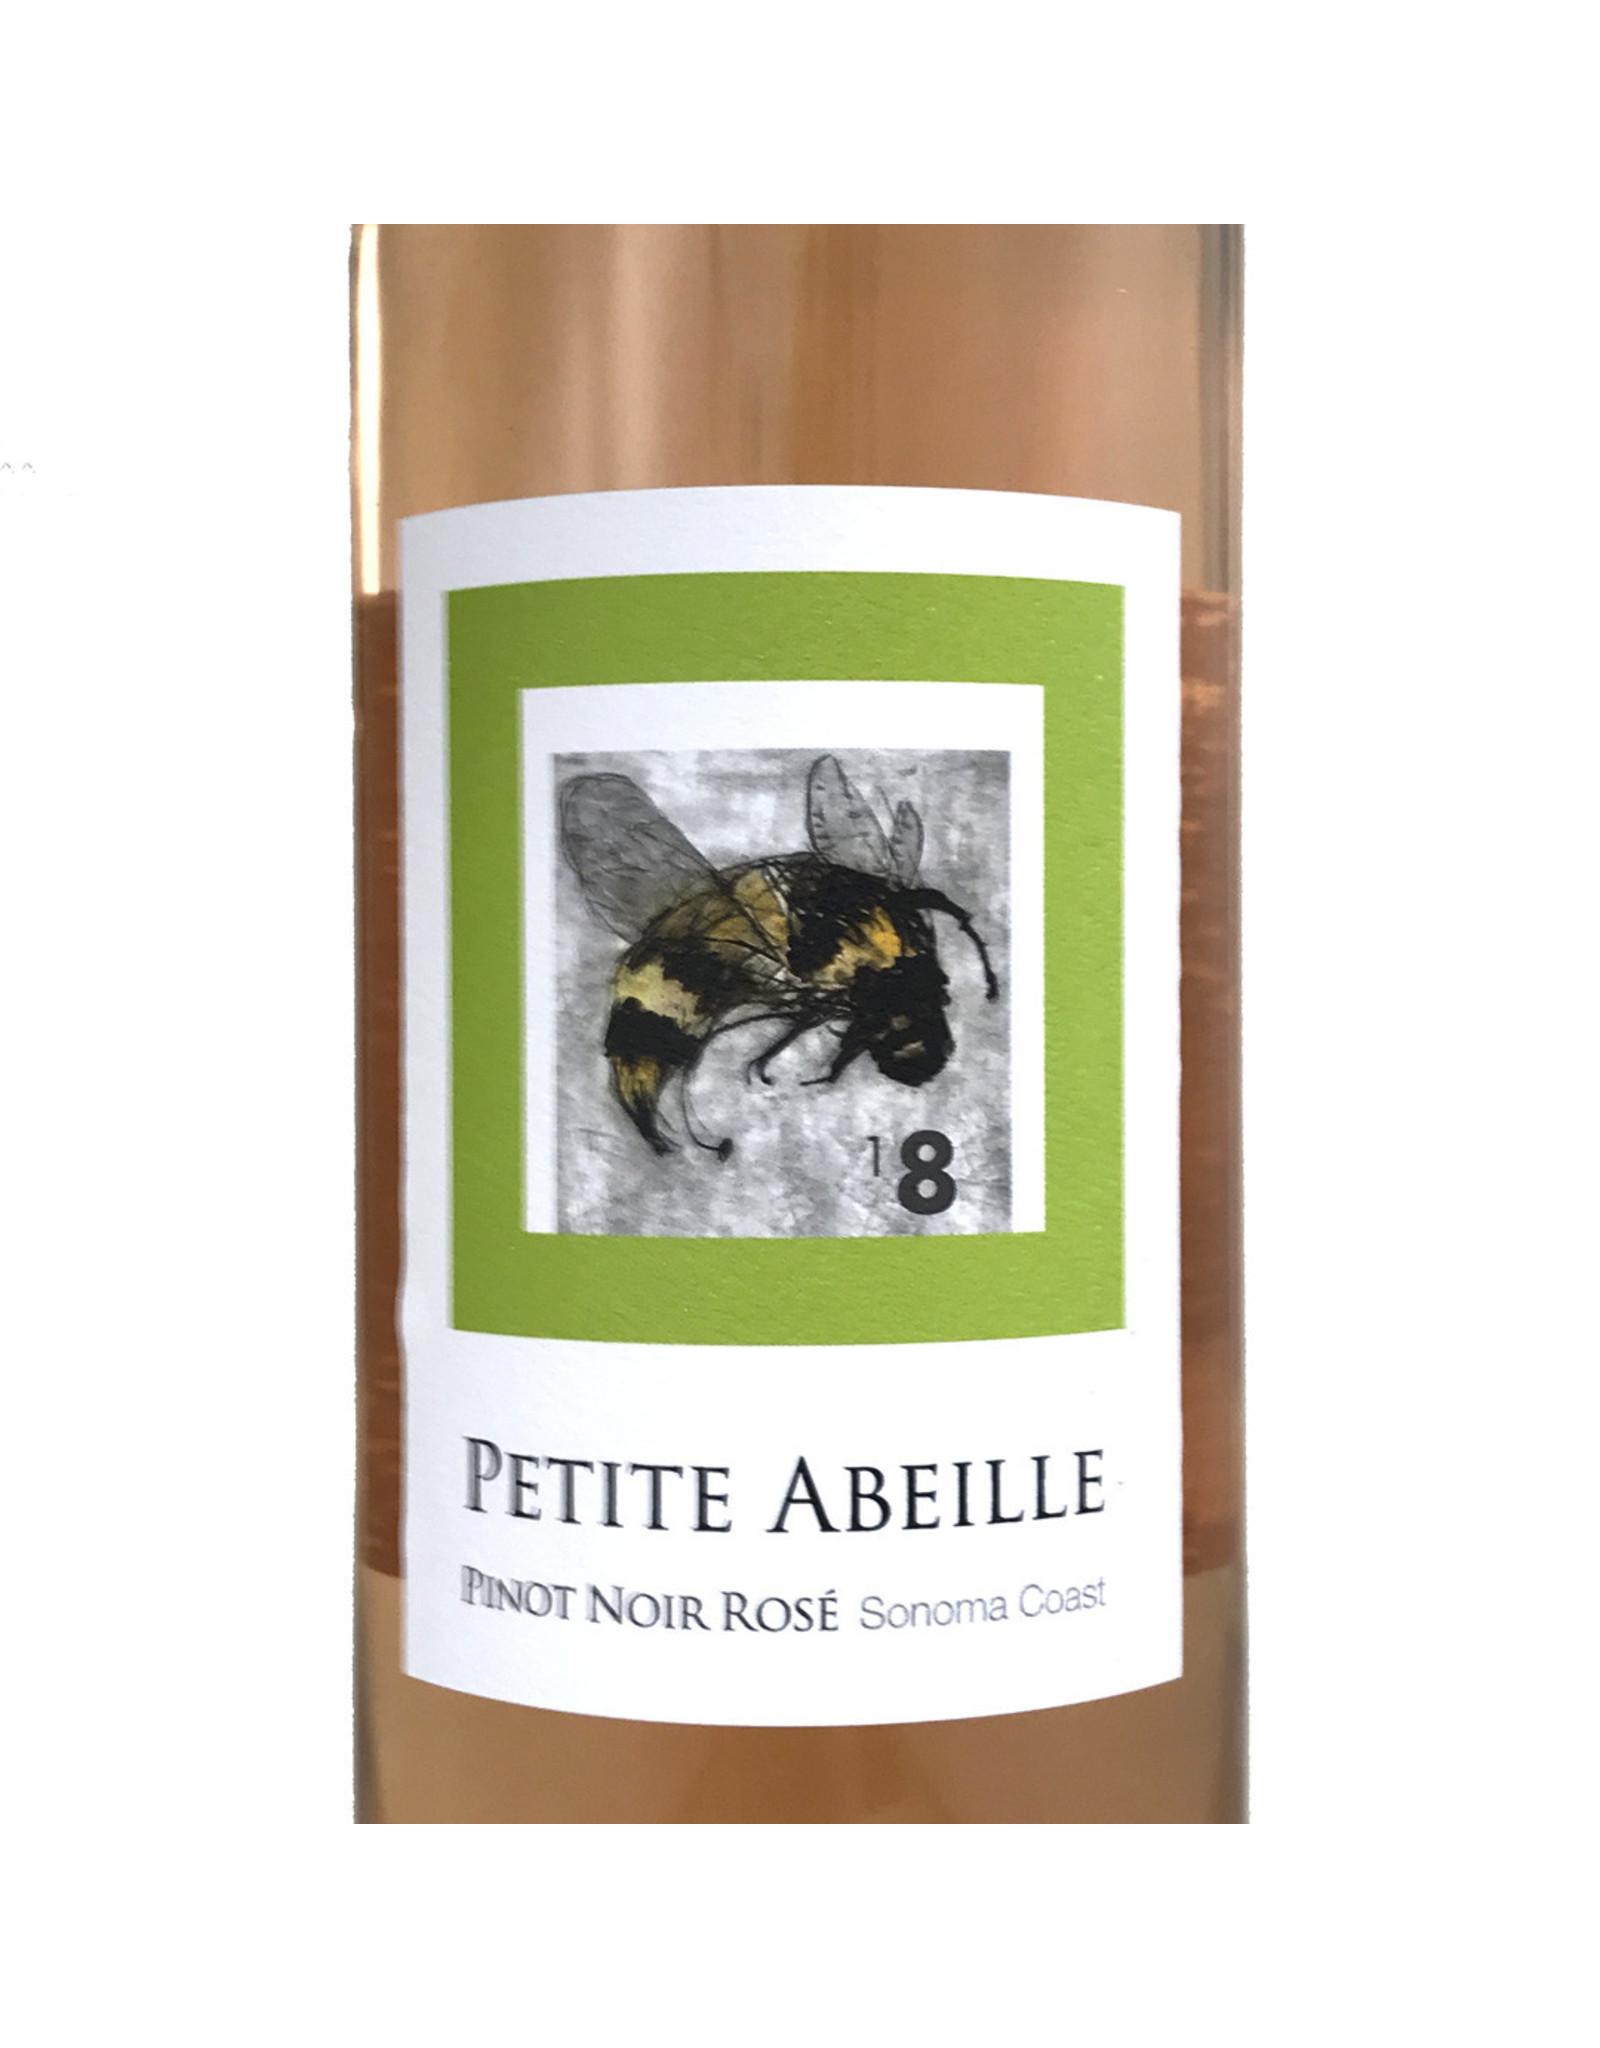 Petite Abeille Rose of Pinot Noir 2019